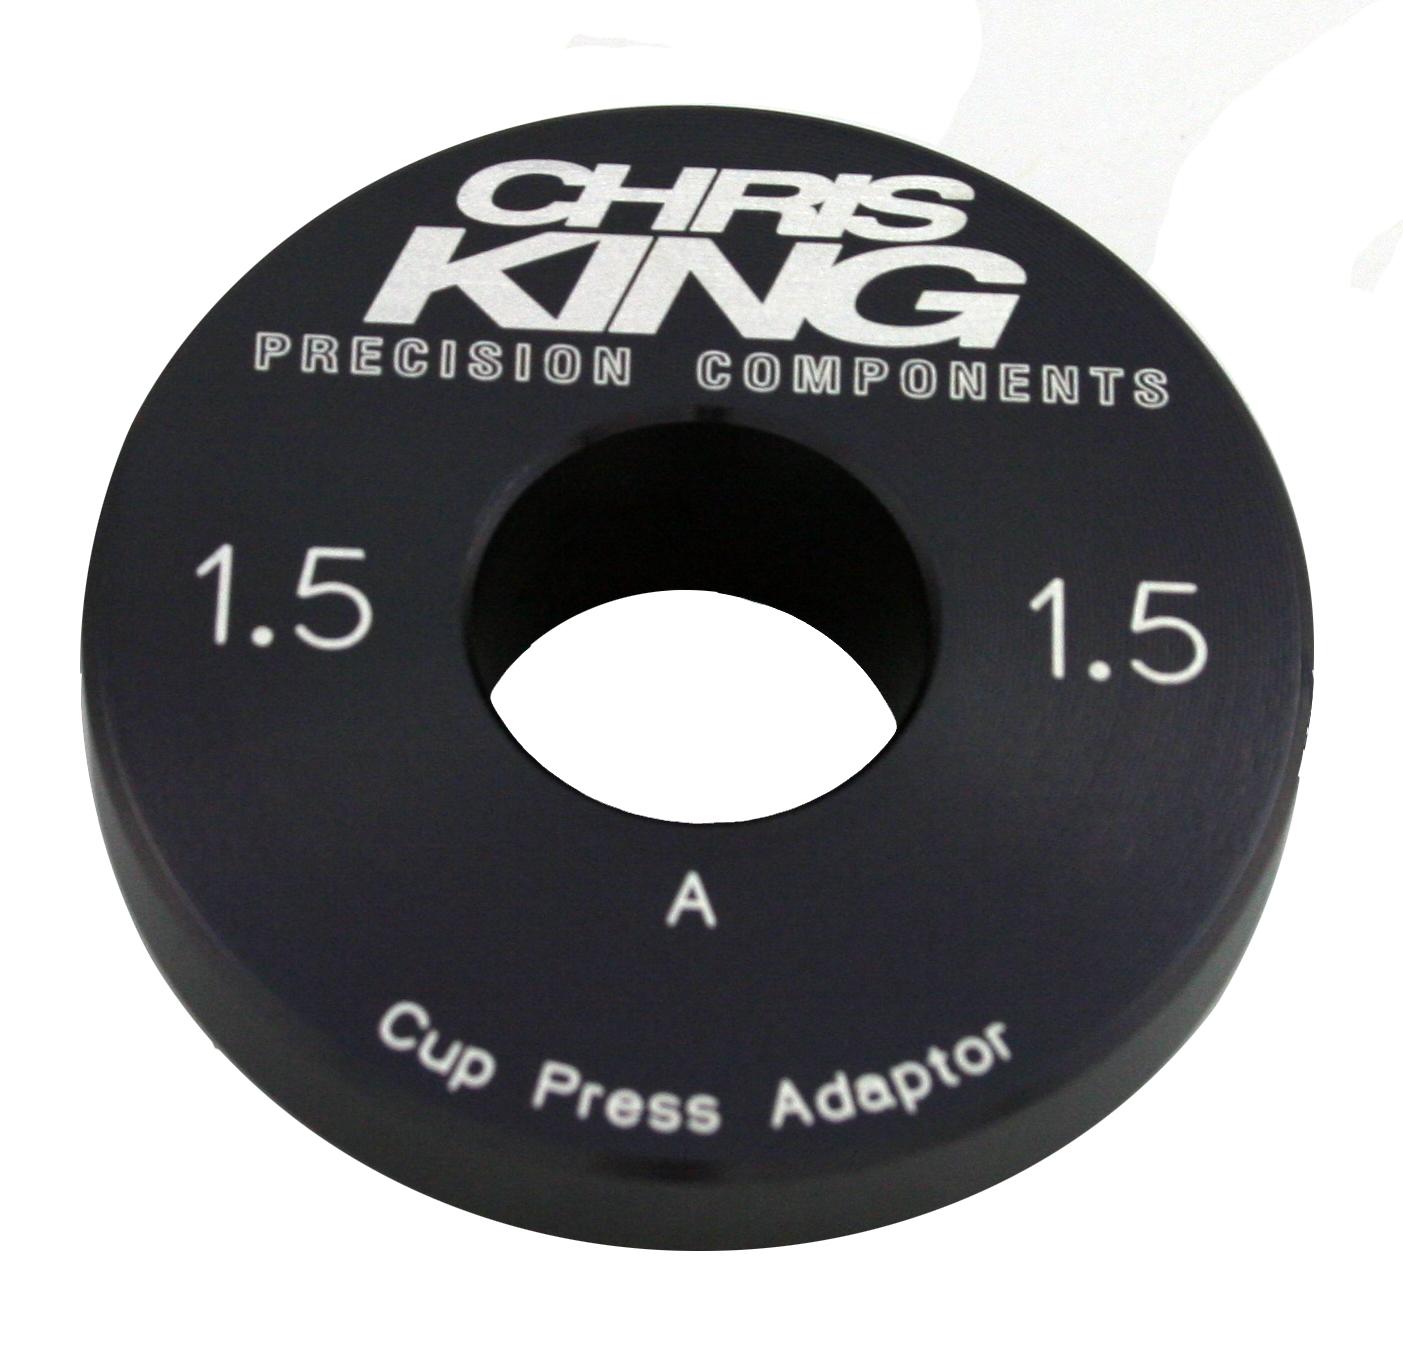 Chris King Headset Press Adaptors